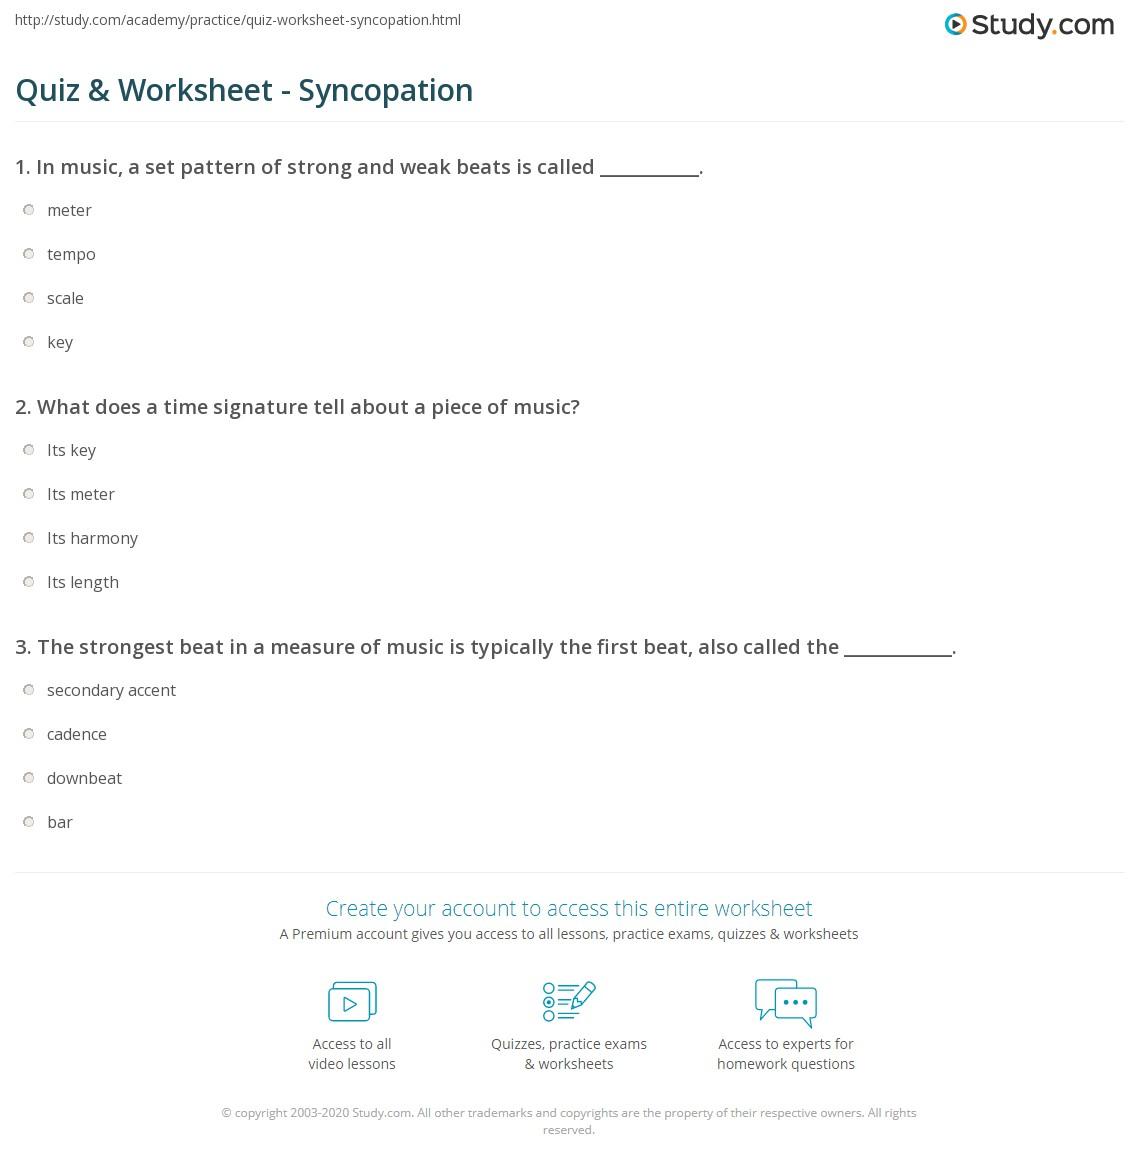 quiz & worksheet - syncopation | study